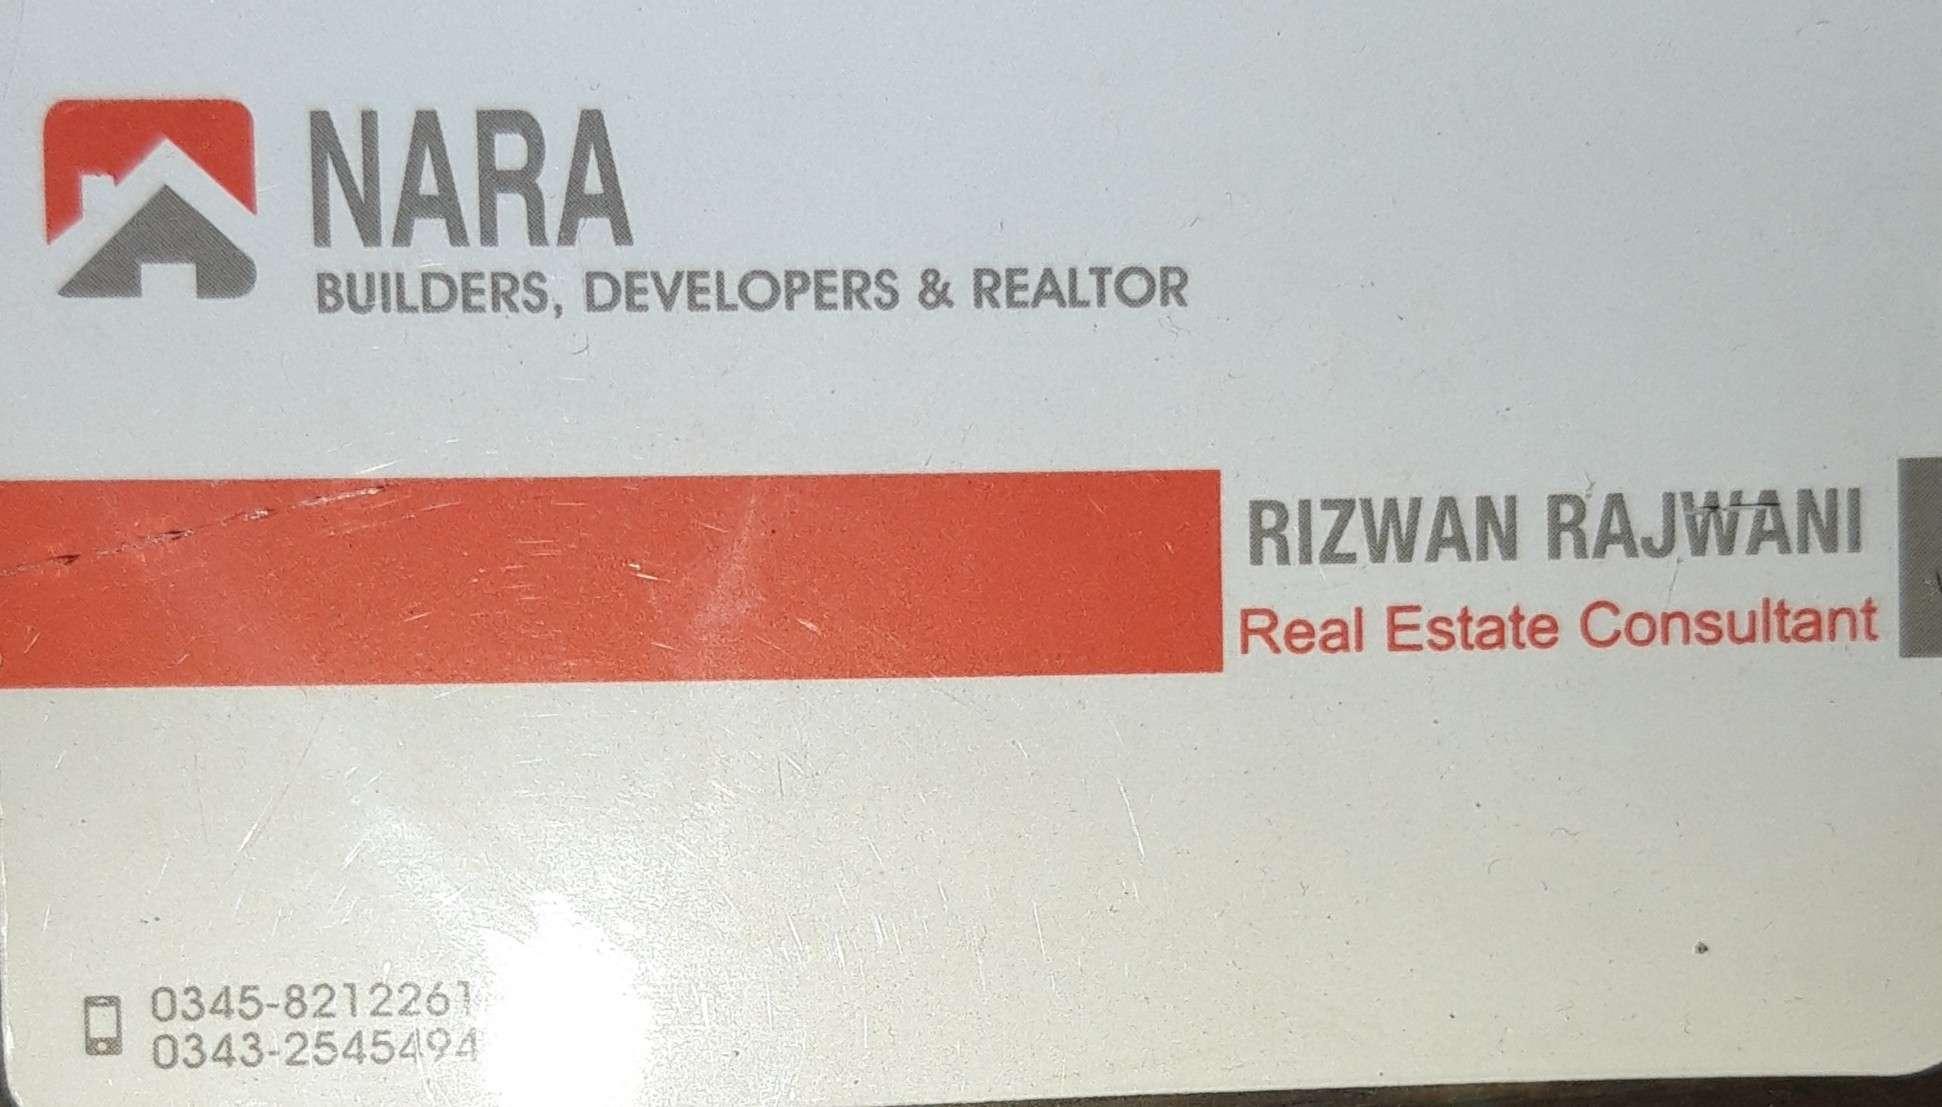 Rizwan Rajwani